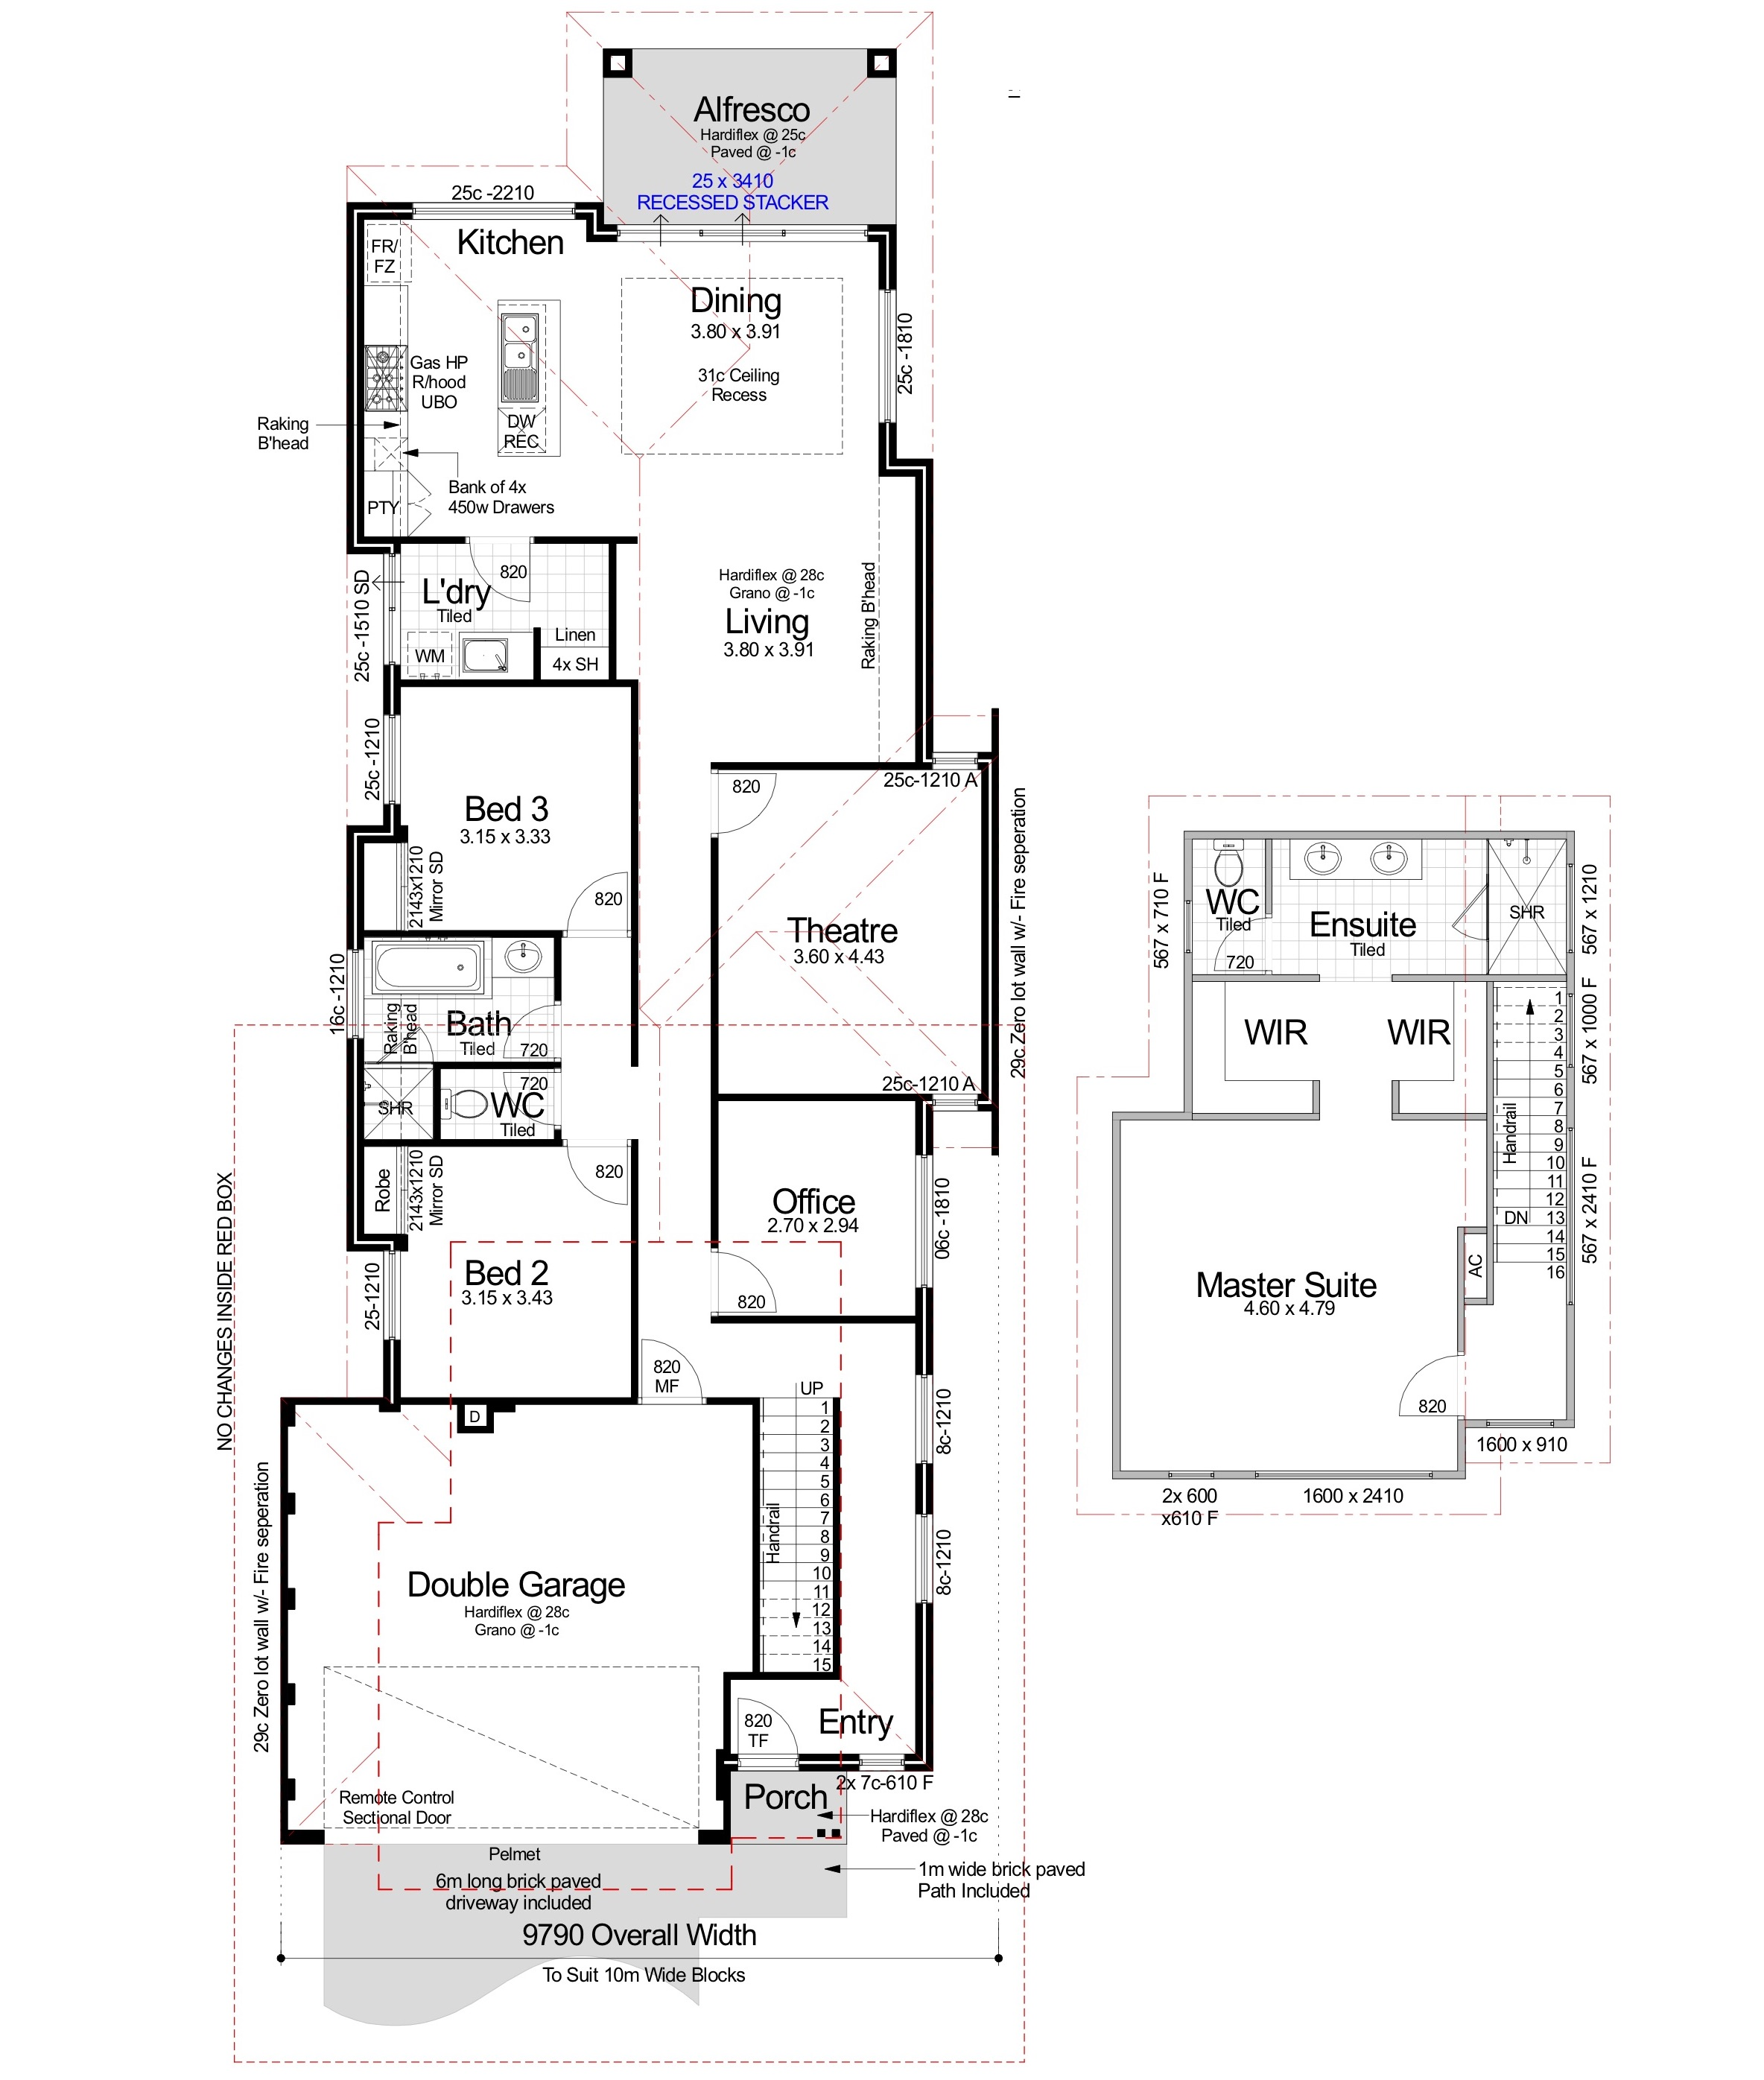 10m_sensation Floorplan